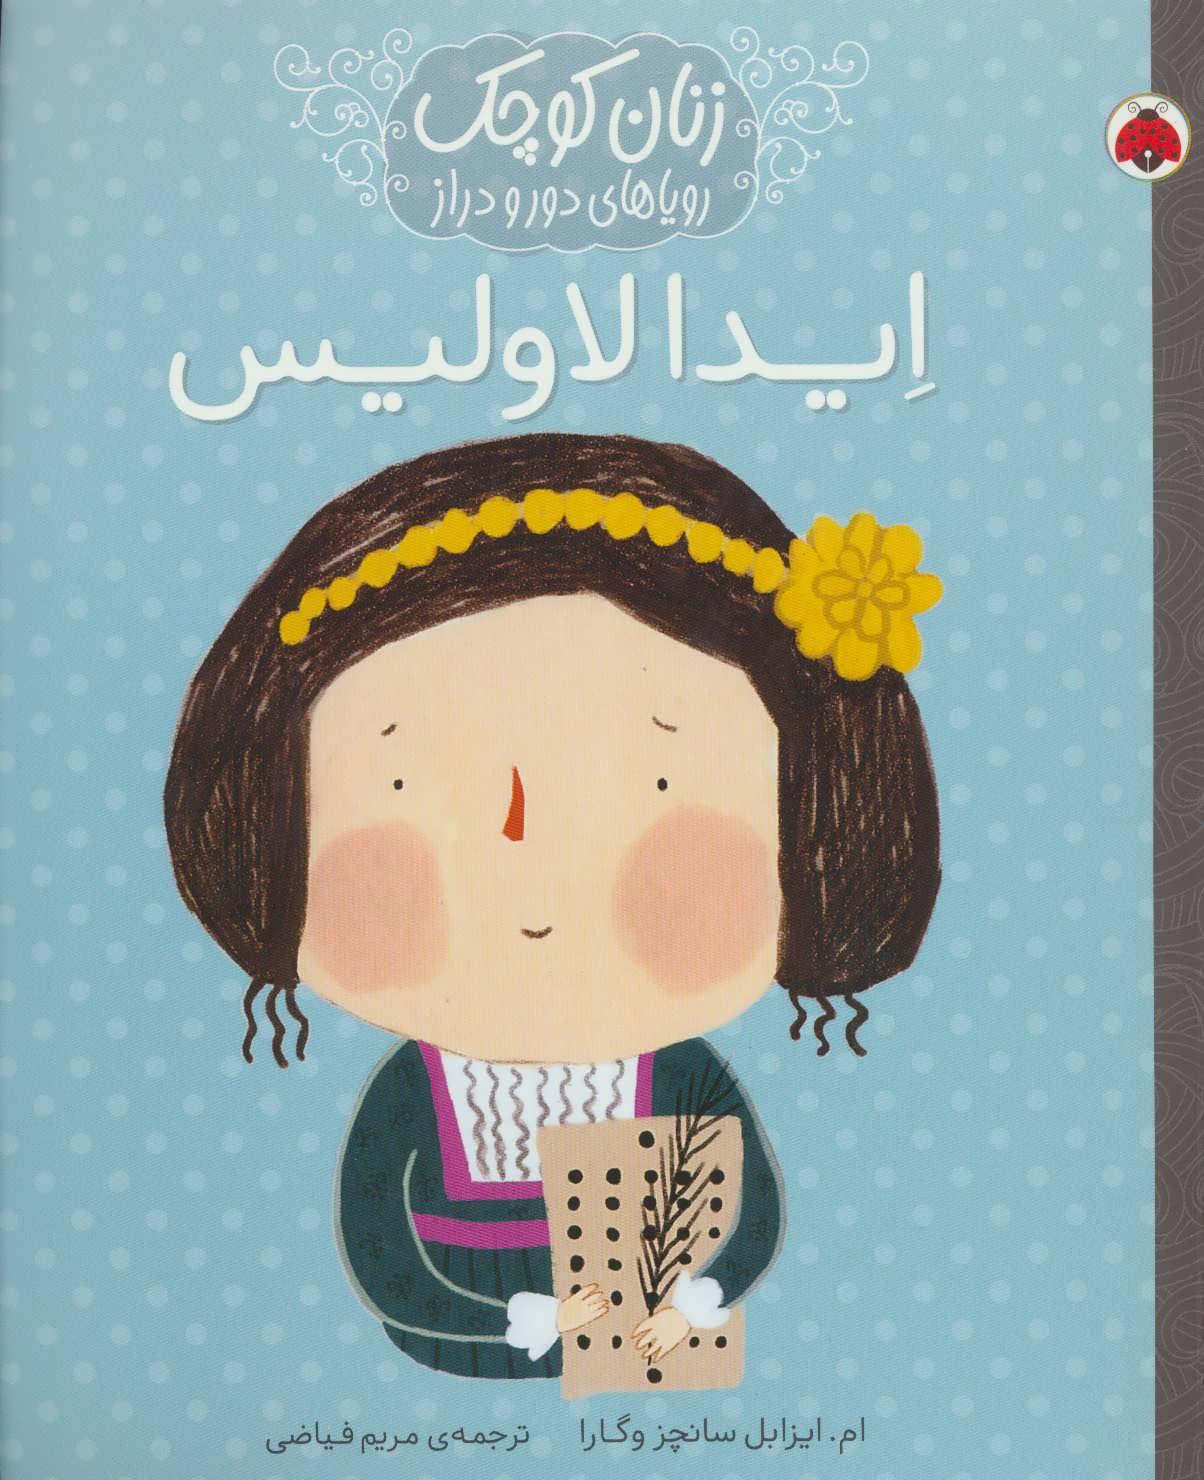 کتاب ایدا لاولیس